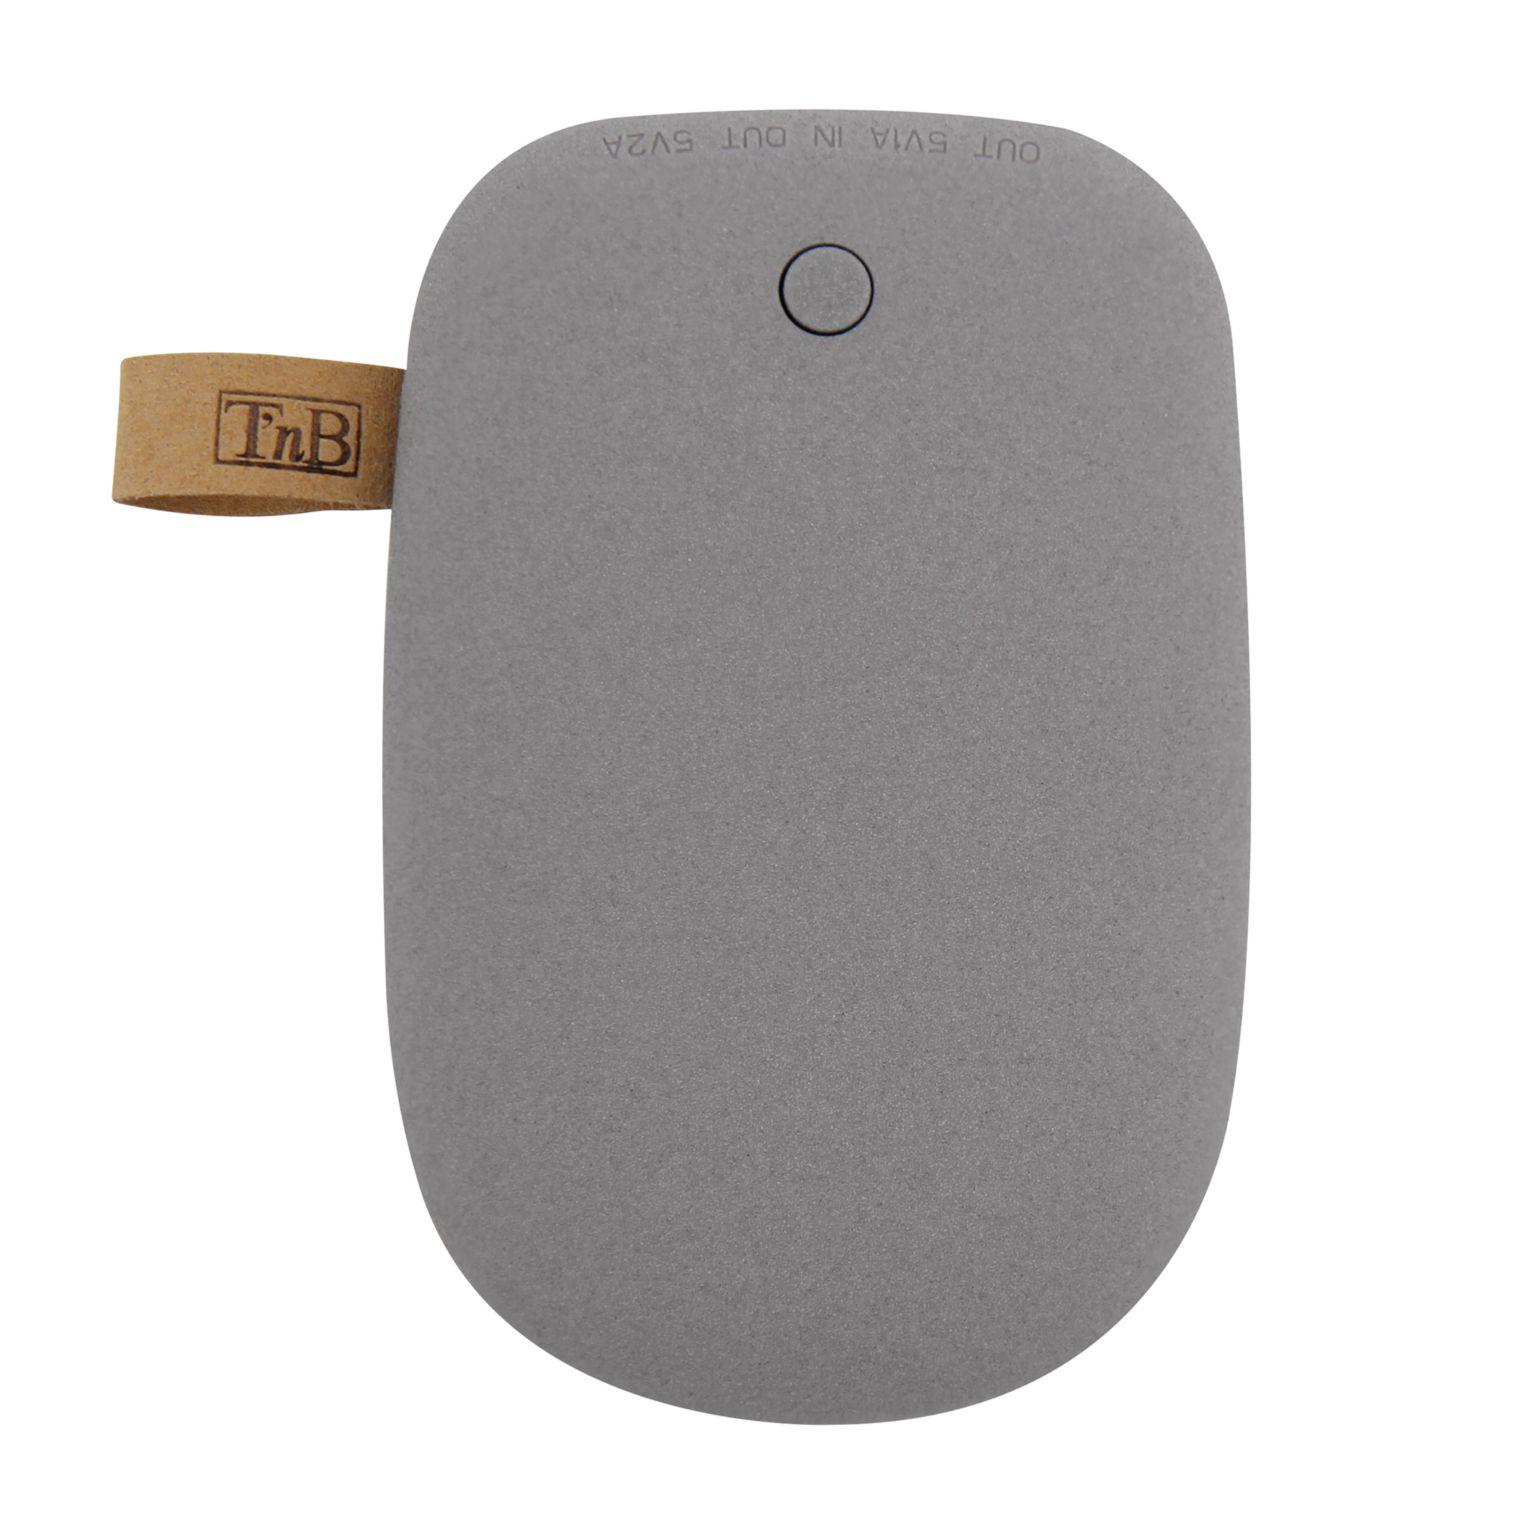 T'nB® | Batterie externe Stone 6600 mAh